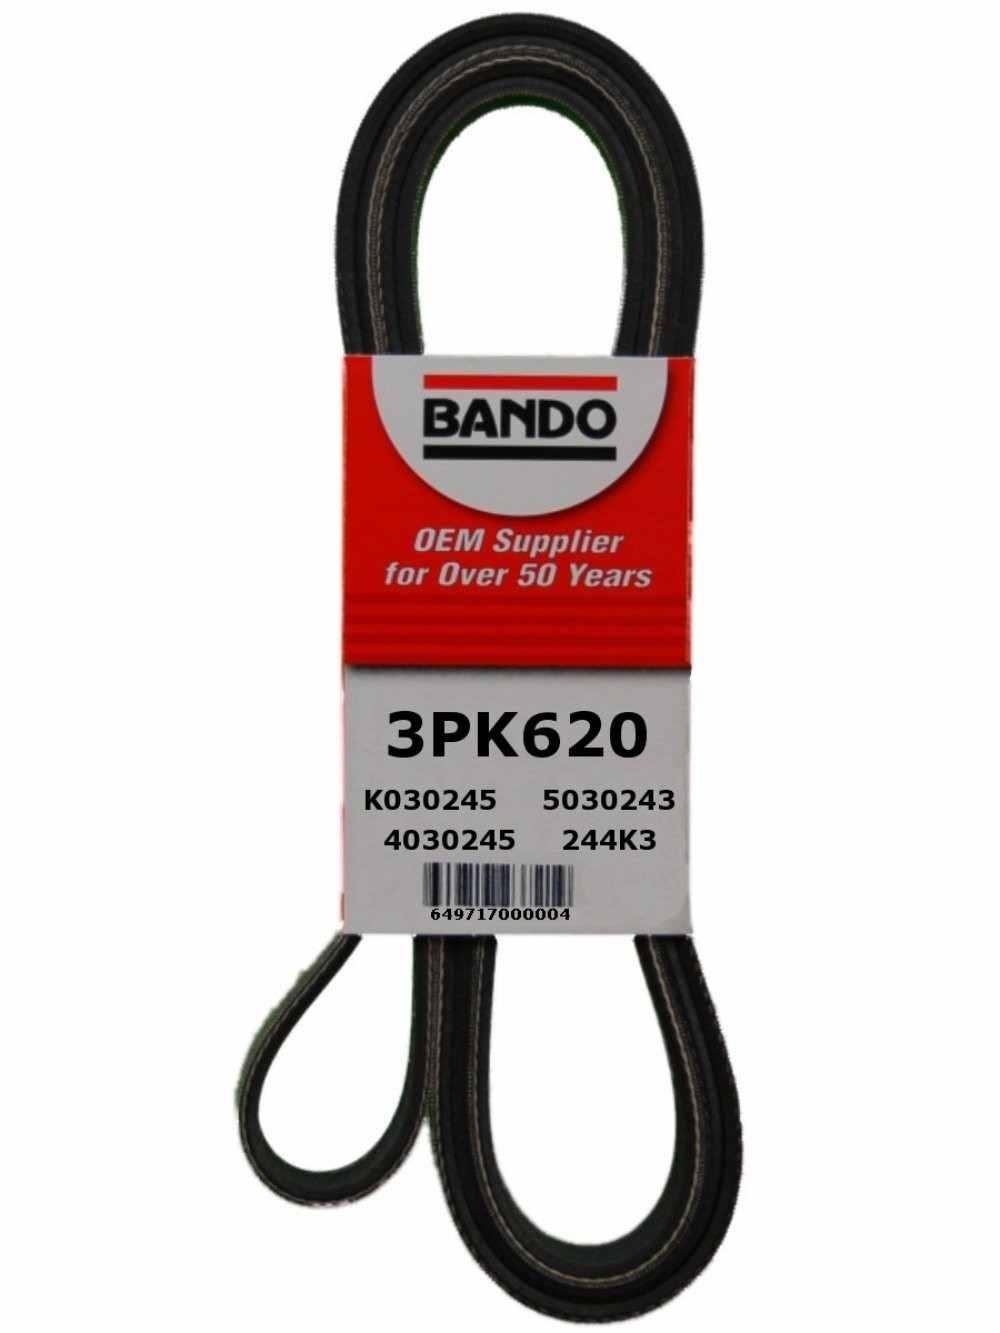 BANDO - Rib Ace Precision Engineered V-Ribbed Belt - BWO 3PK620